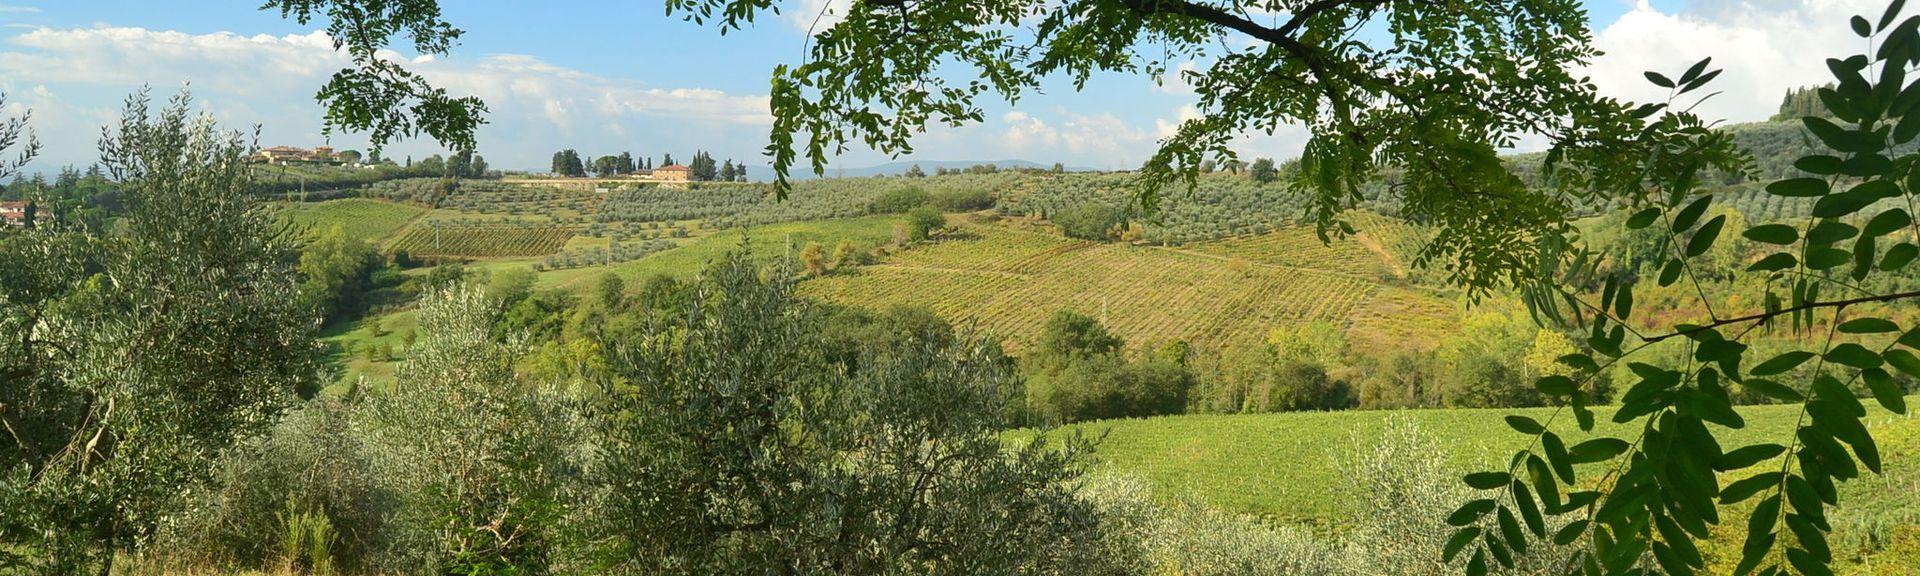 Gambassi Terme, Toscana, Italia